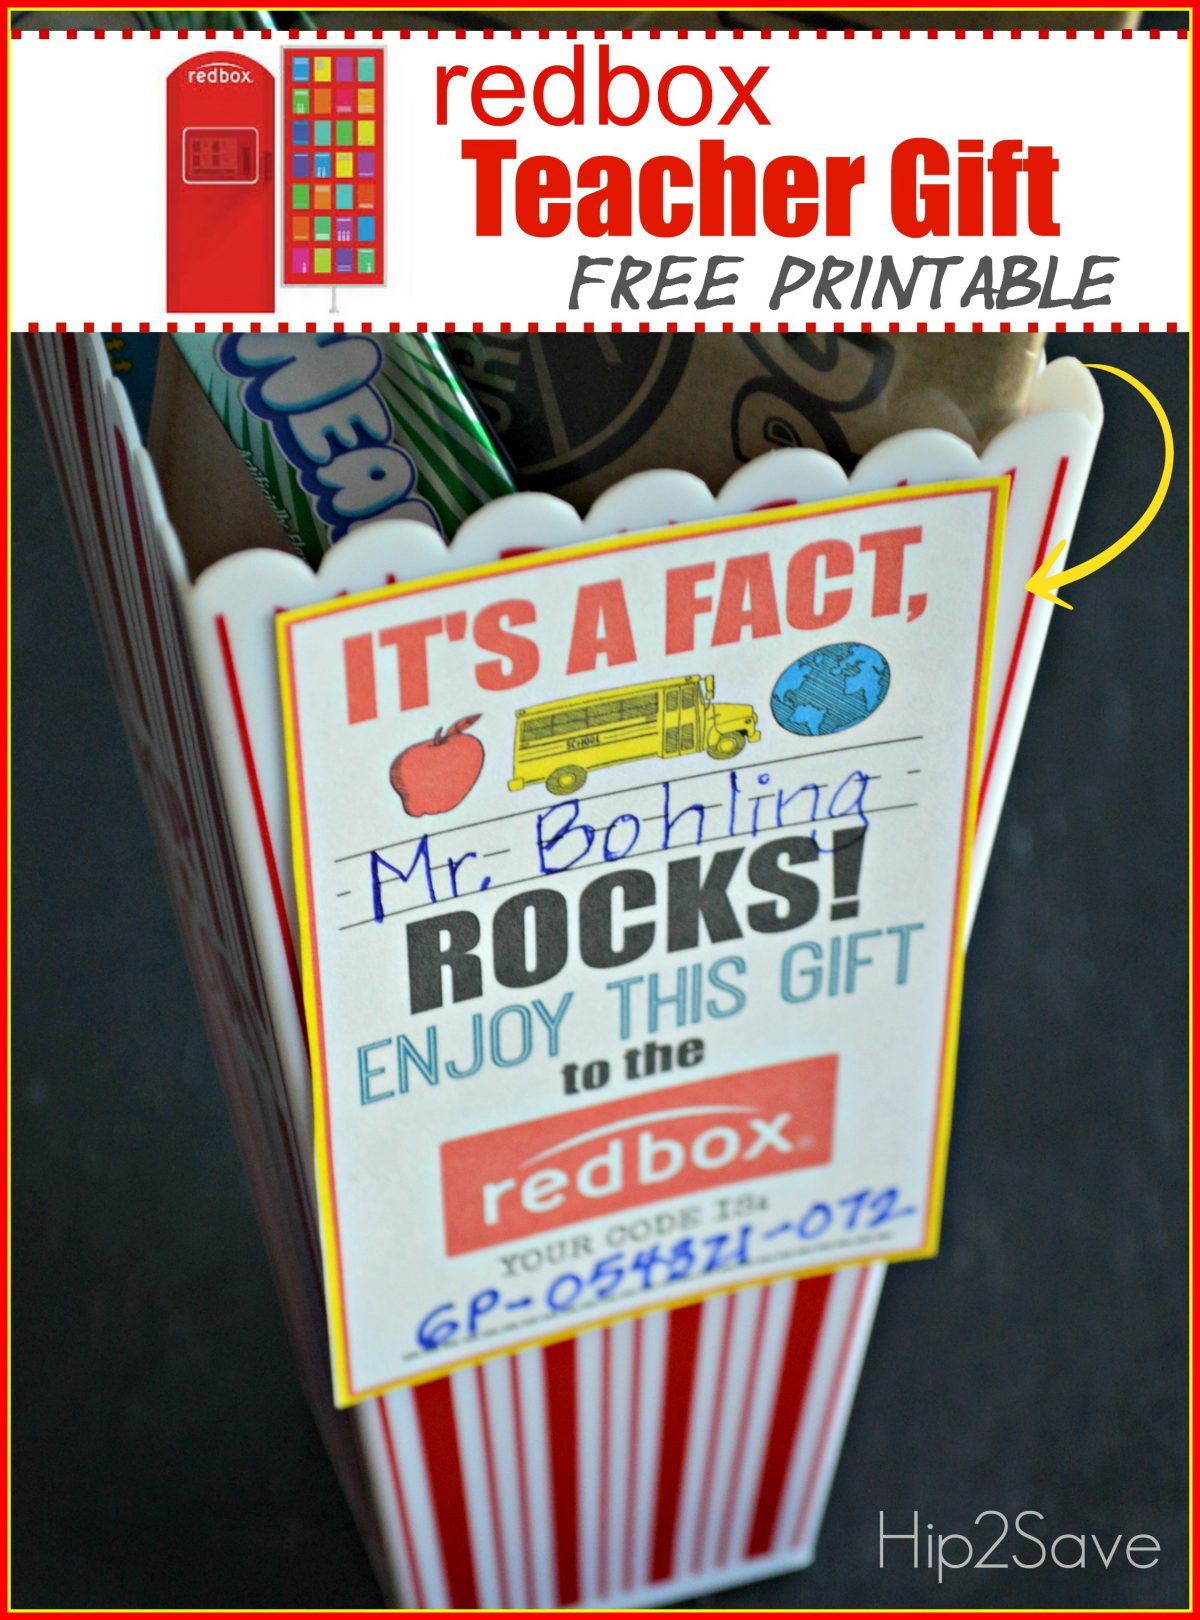 image about Redbox Gift Card Printable called Trainer Appreciation Reward Concept: Present a Redbox Code (No cost